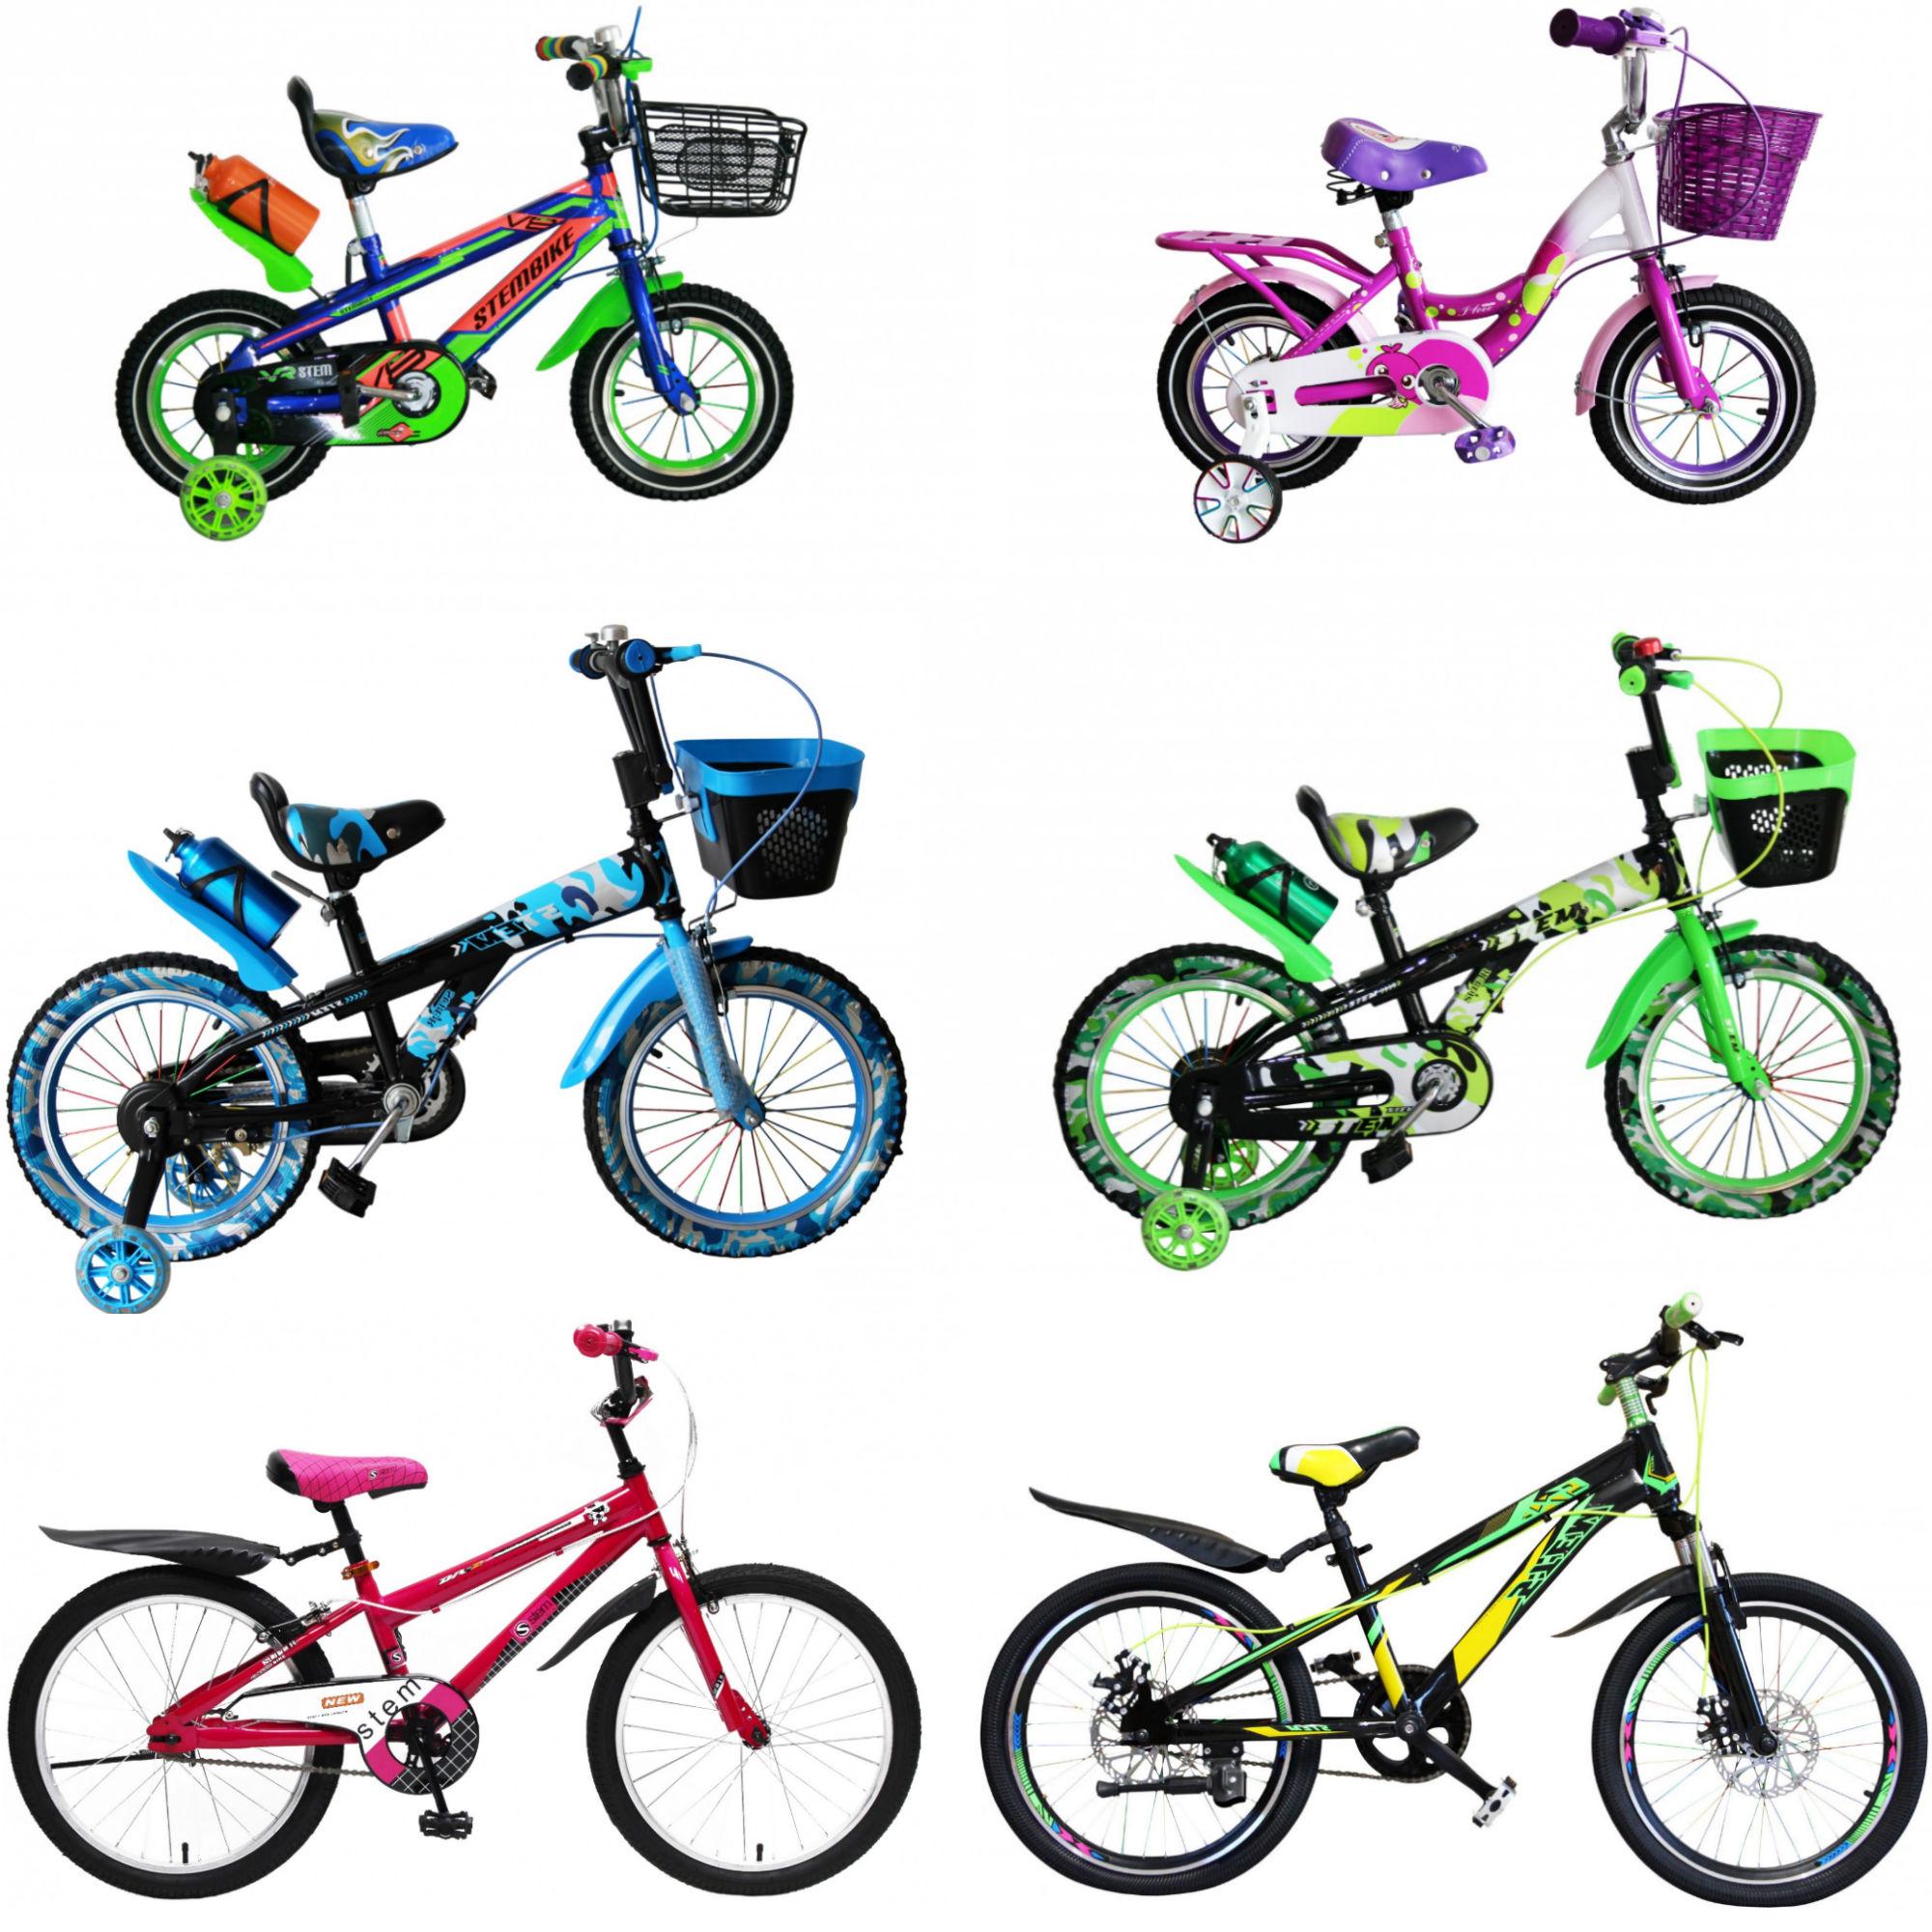 kinderfahrrad 12 16 20 zoll kinder fahrrad spielrad rad. Black Bedroom Furniture Sets. Home Design Ideas